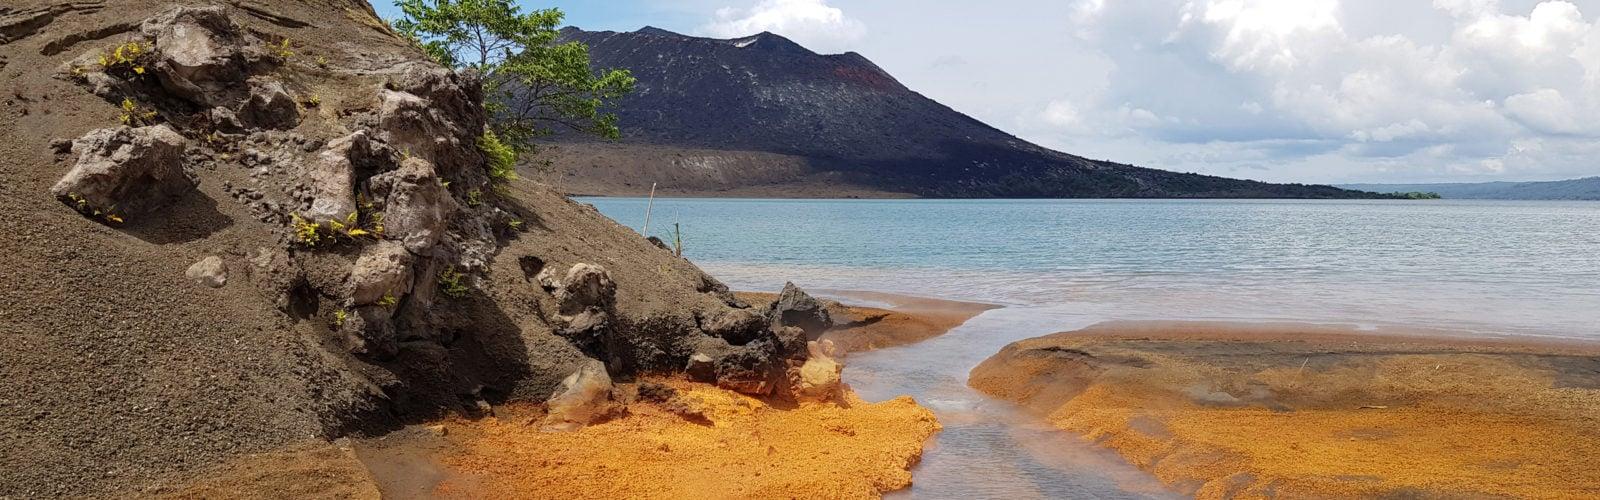 papua-new-guinea-volcano